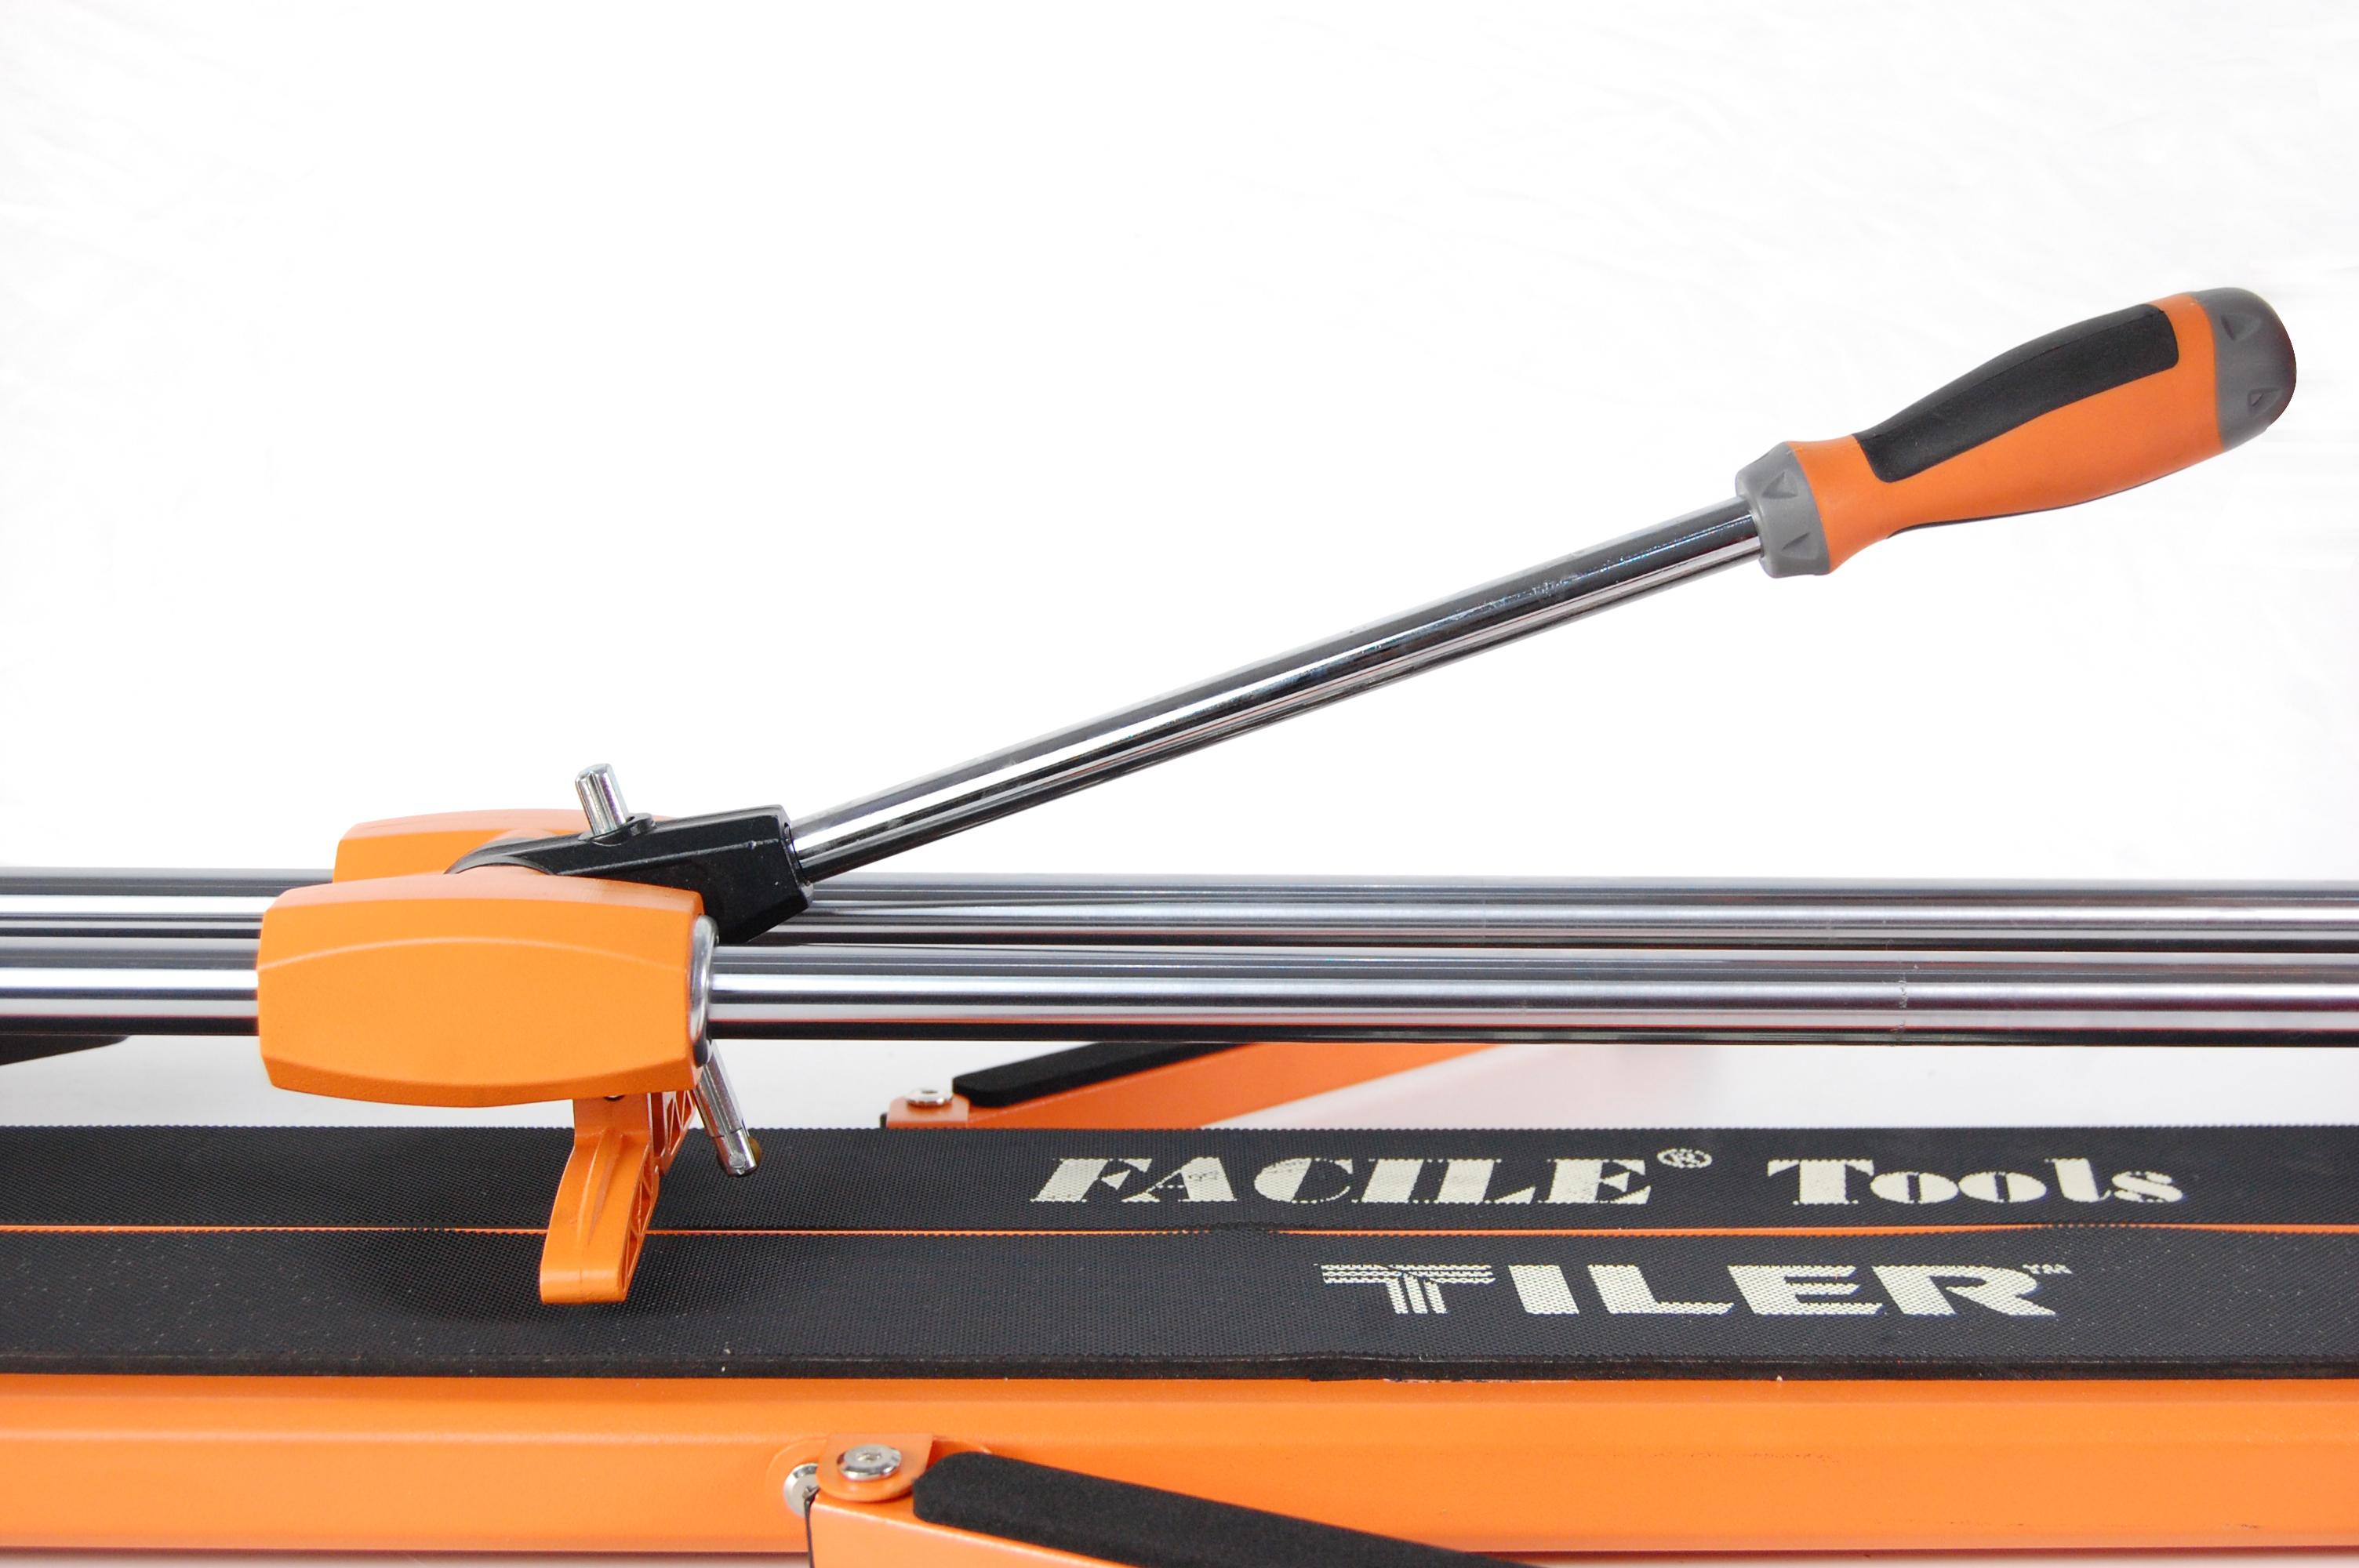 Facile 3 feet Professional Manual tile cutter 900 mm ( 36 inch)